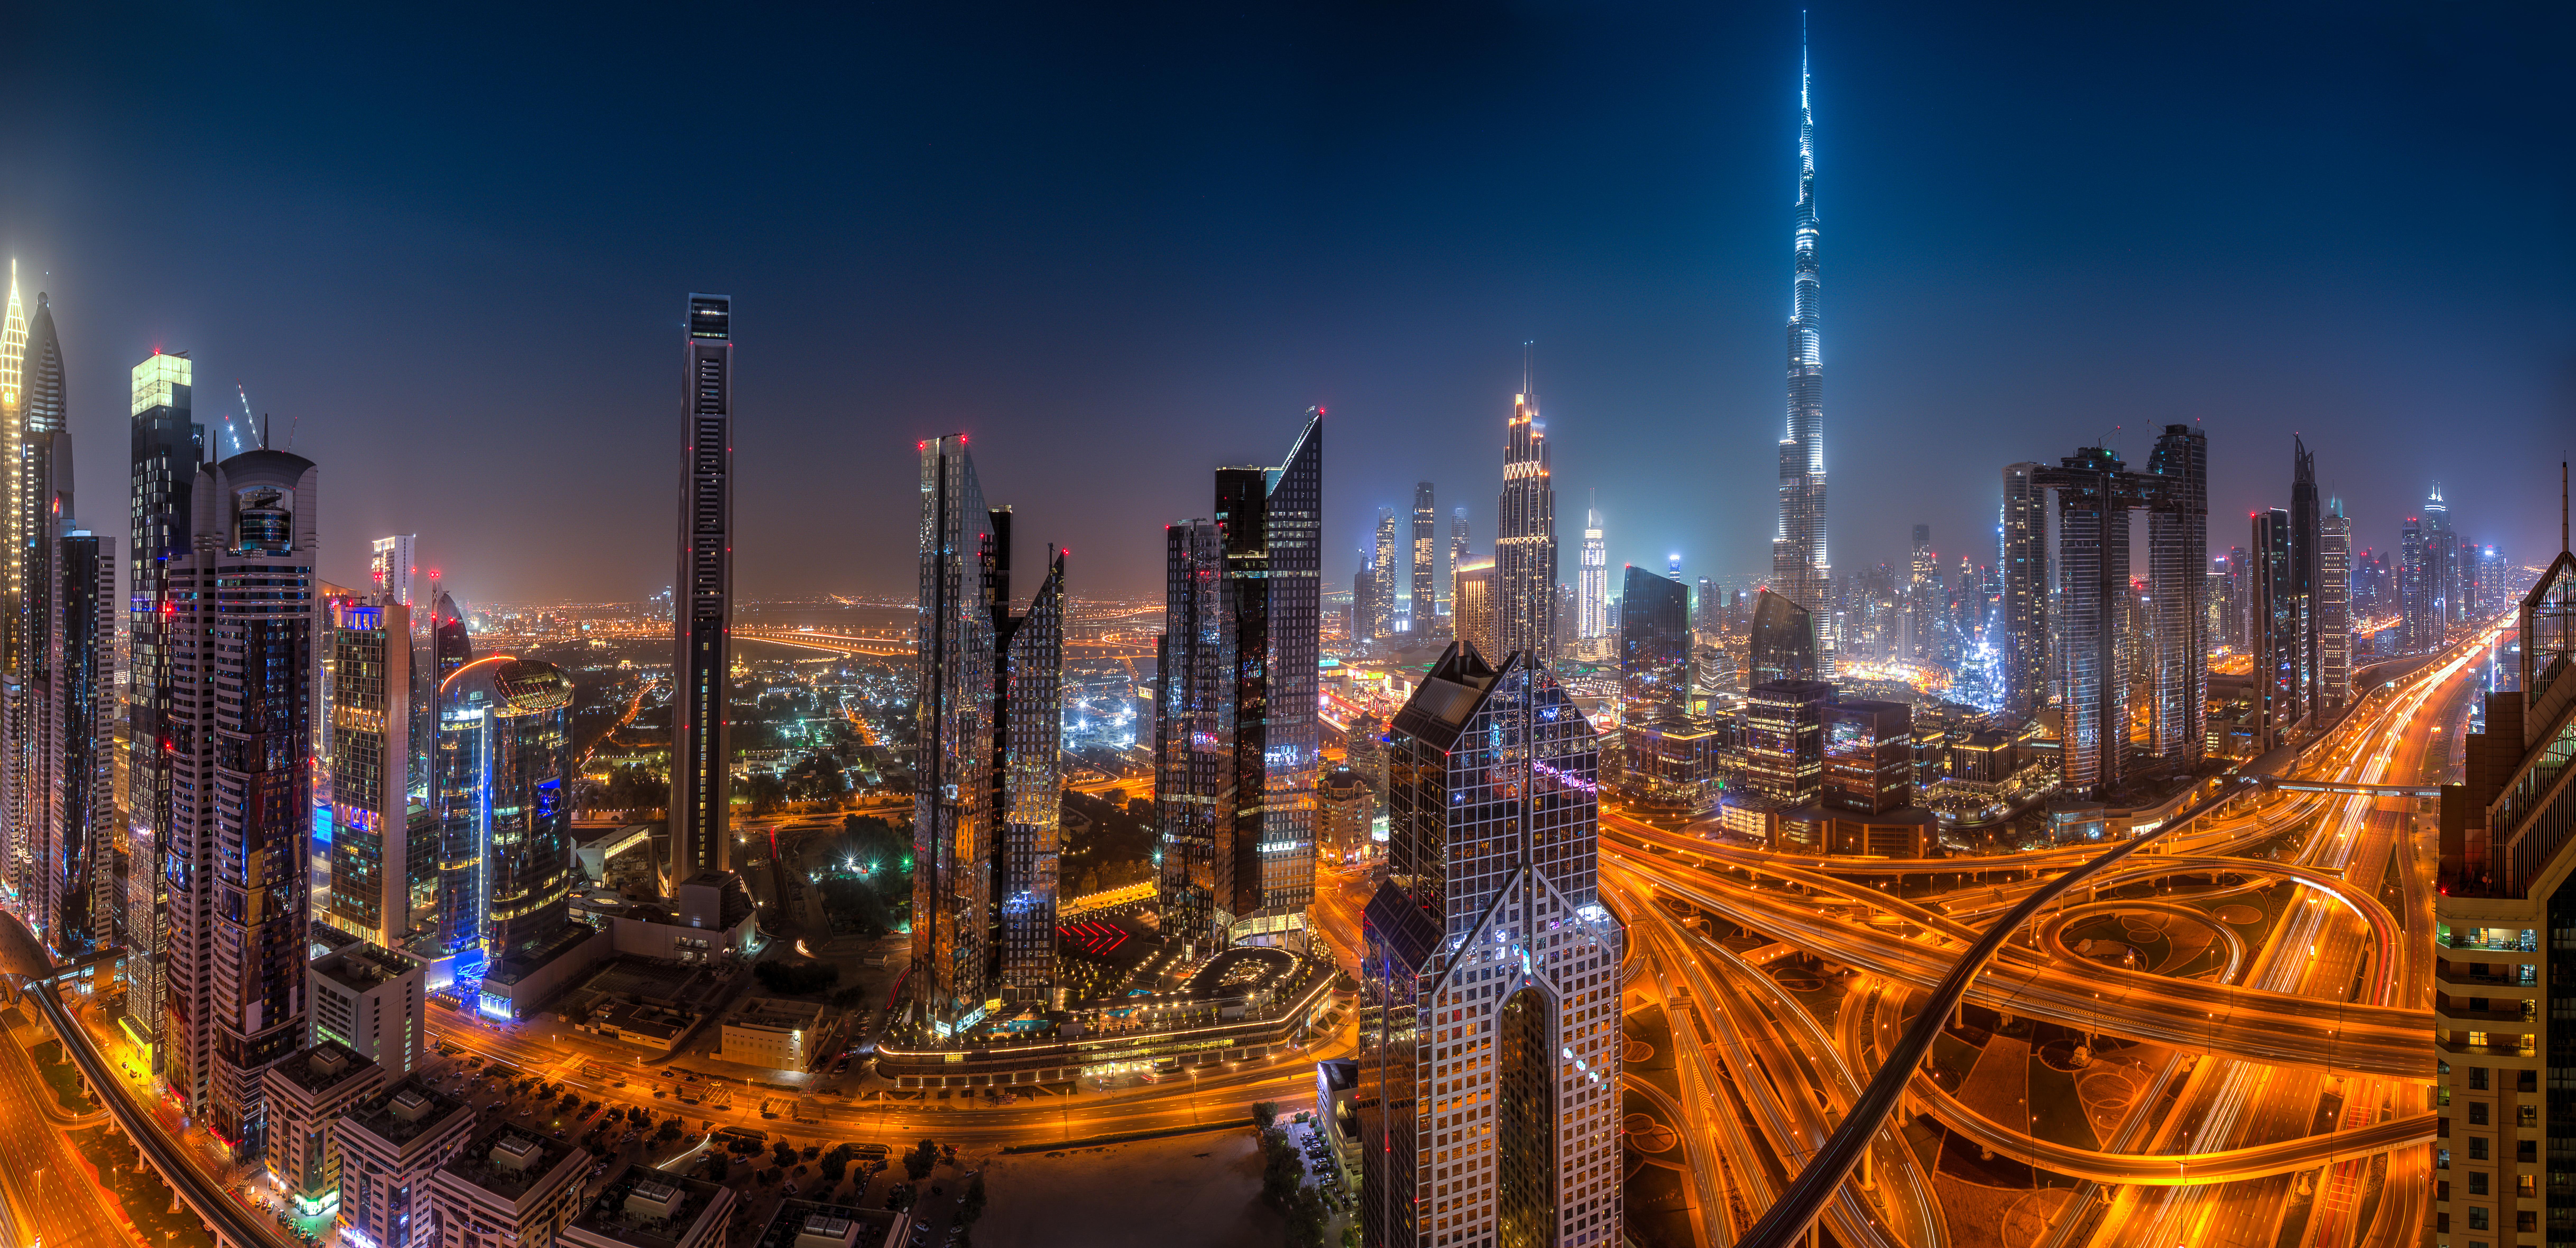 Sheikh_Zayed_crossroad_night_2